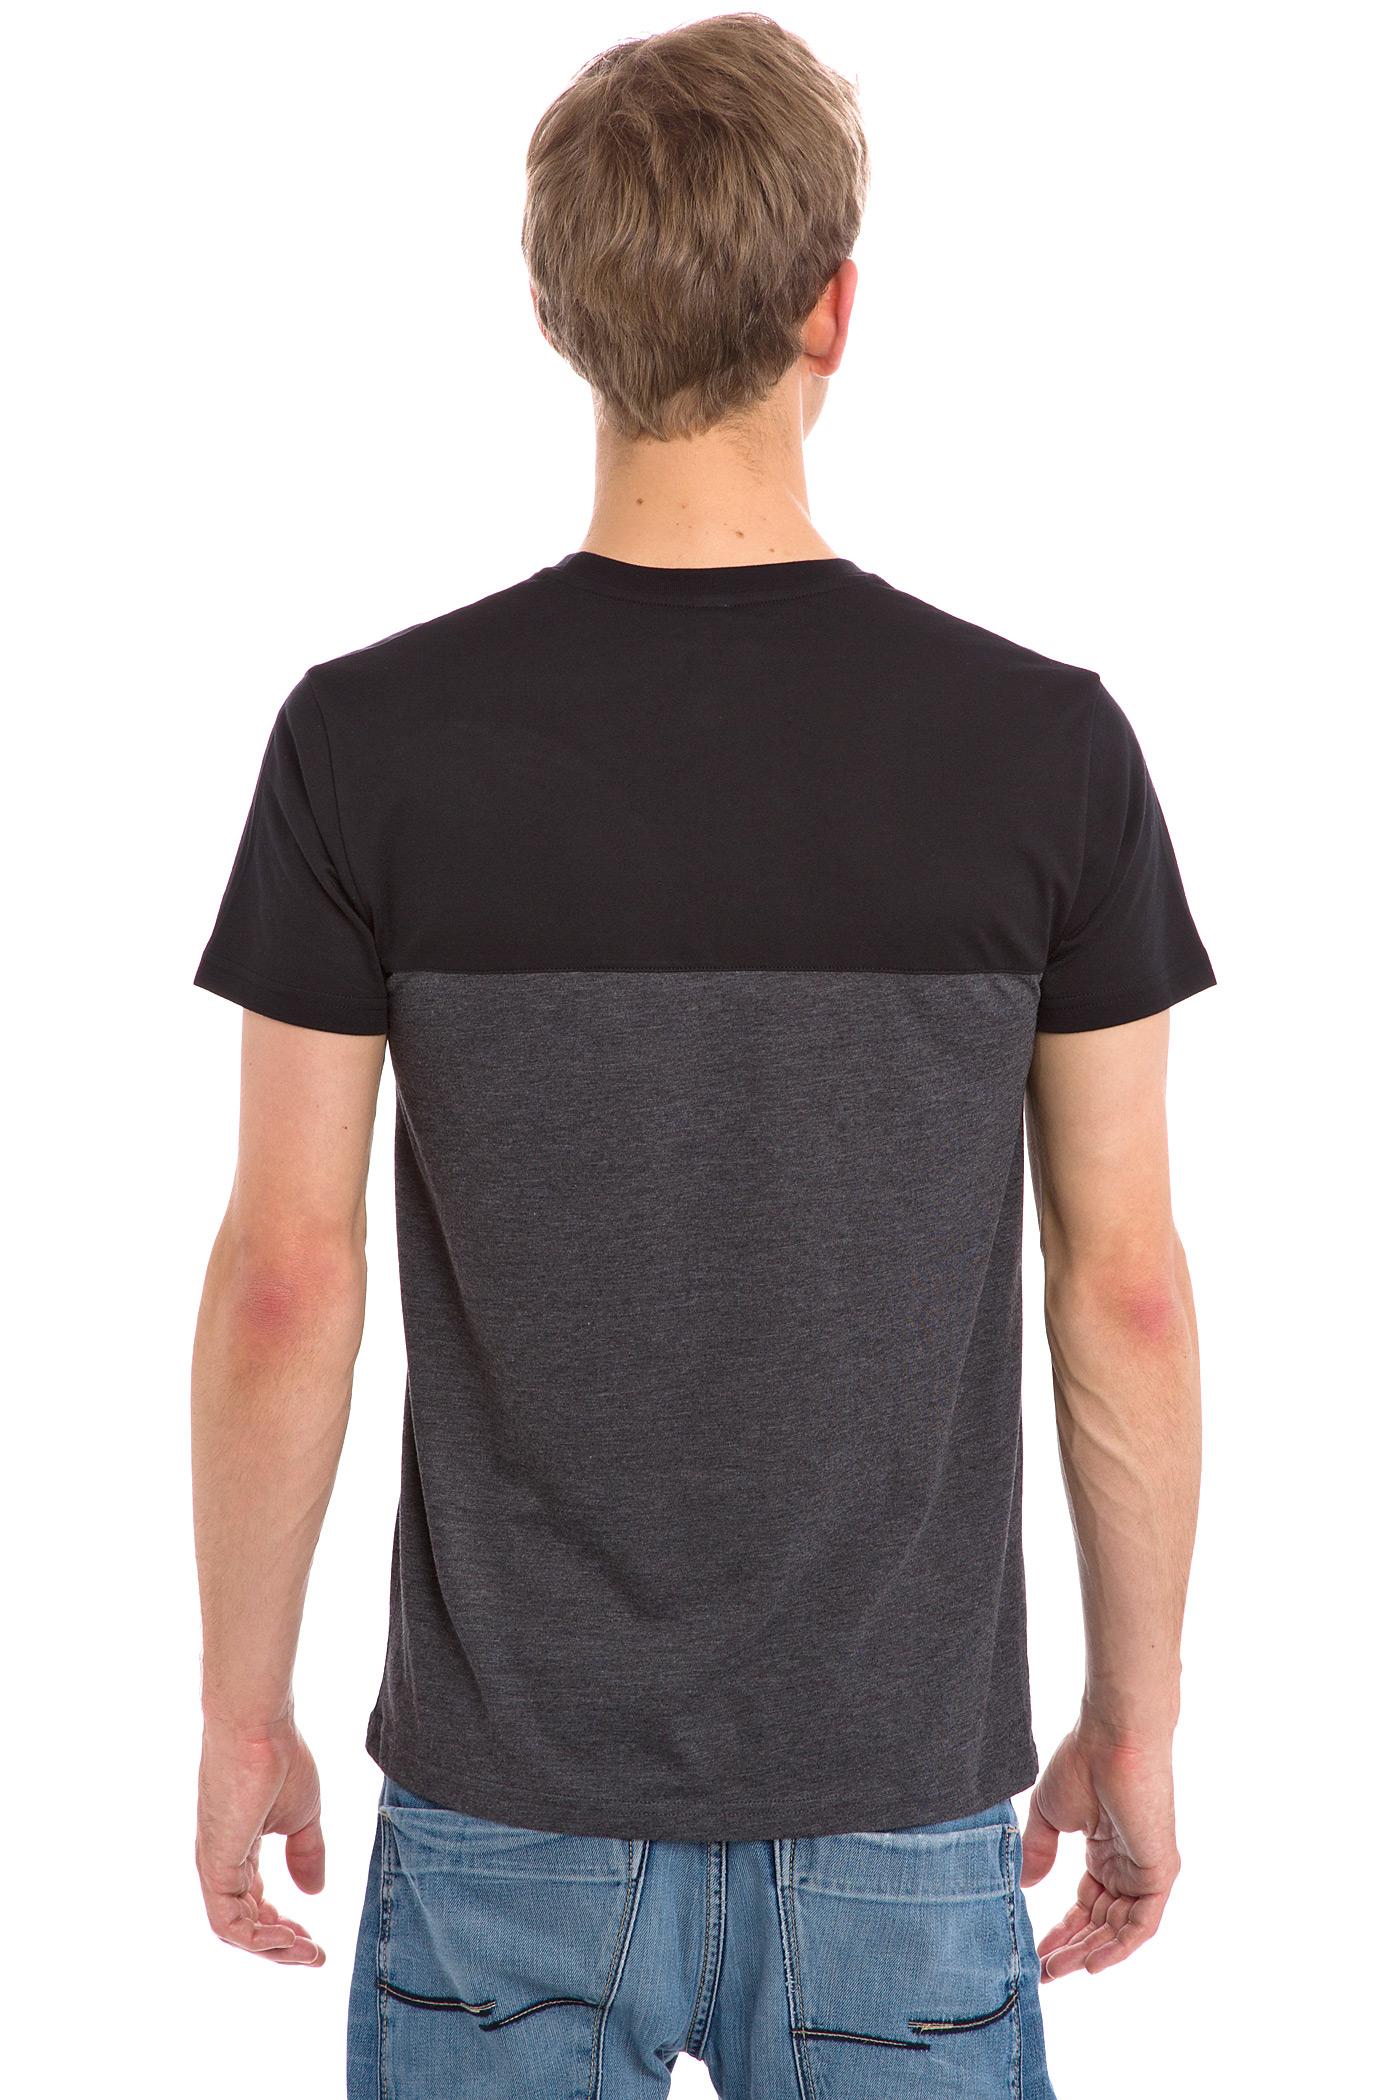 iriedaily block pocket t shirt black buy at skatedeluxe. Black Bedroom Furniture Sets. Home Design Ideas